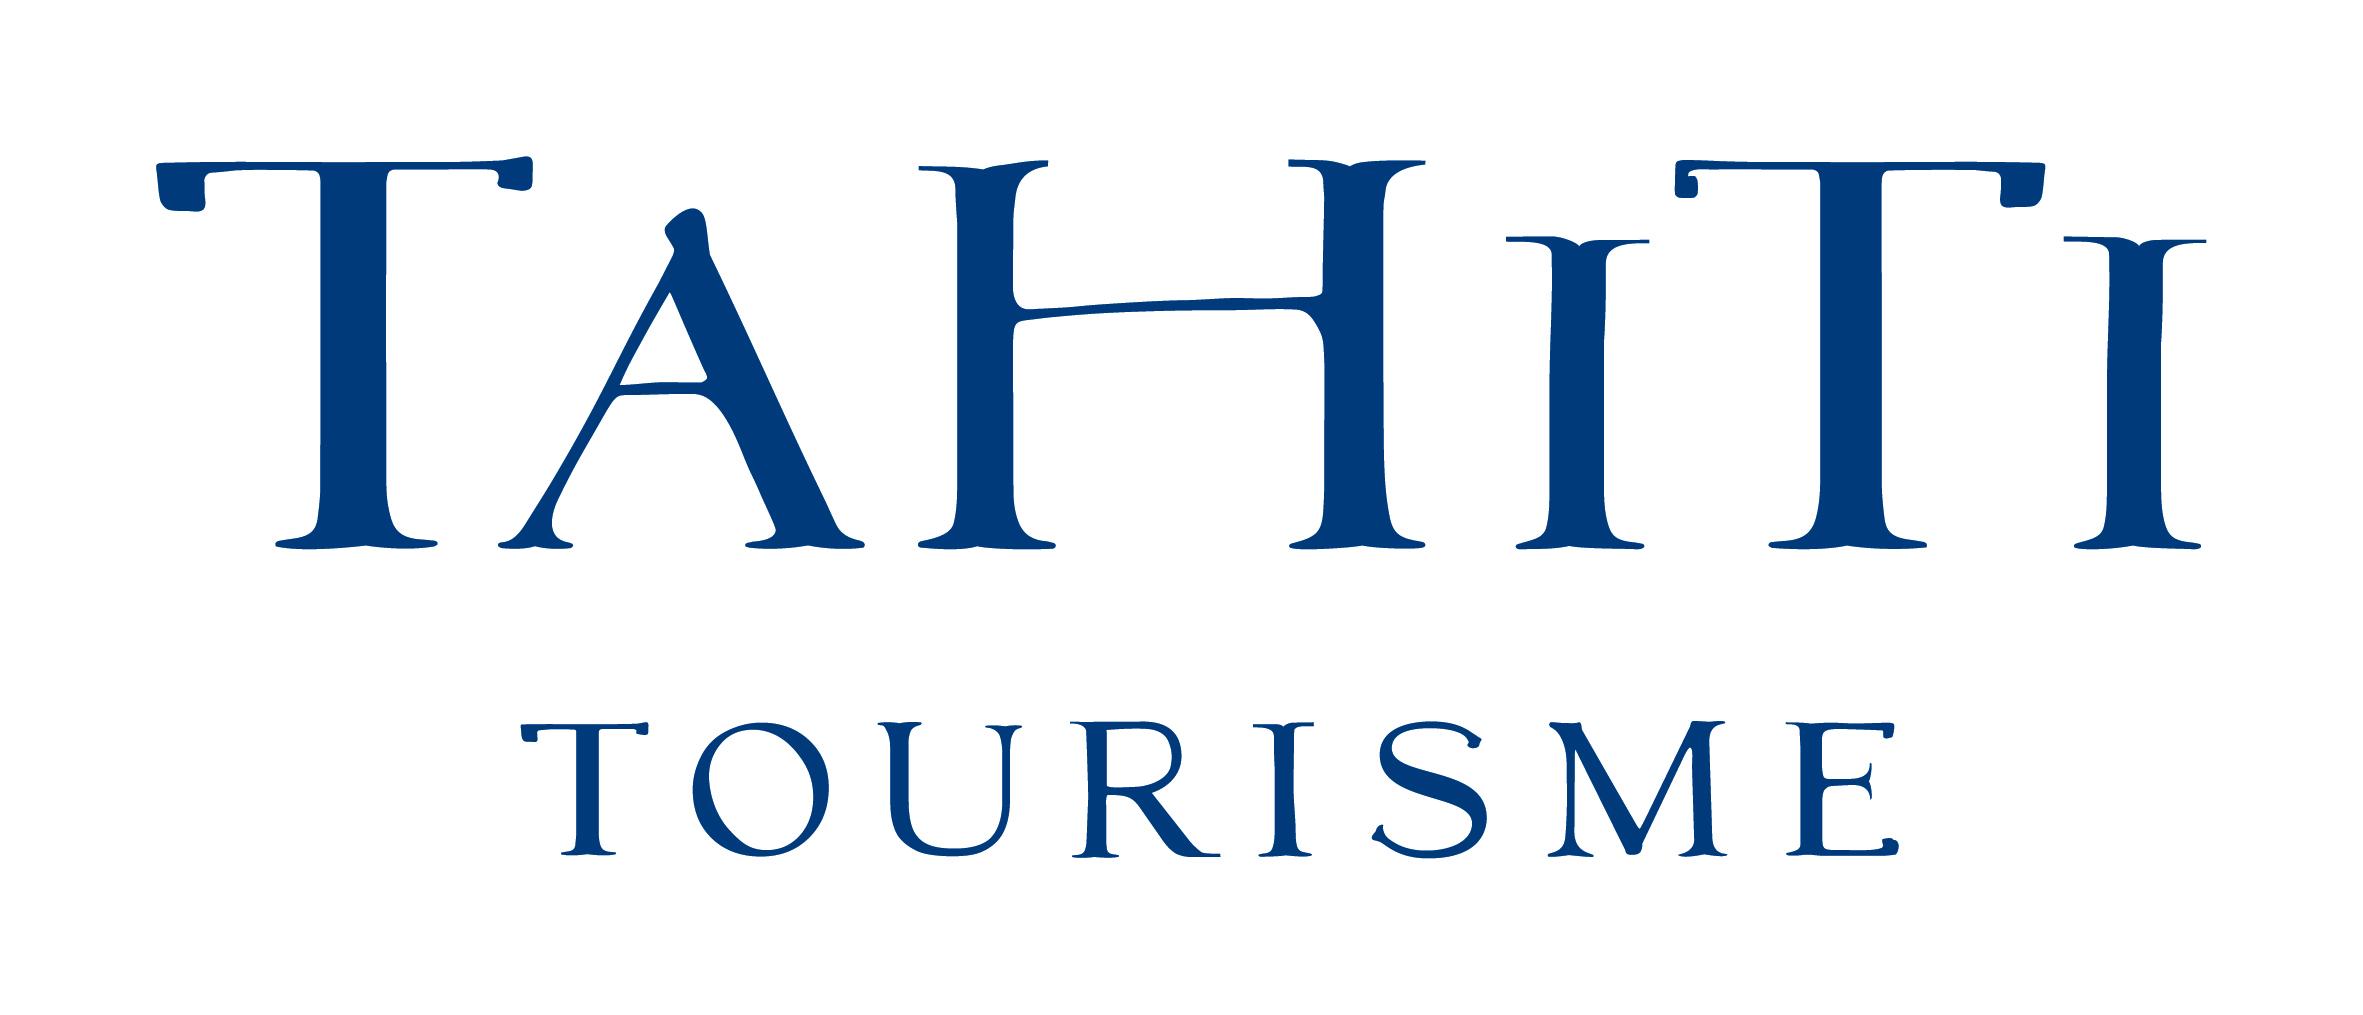 https://tahititourisme.com.au/wp-content/uploads/2020/12/TAHITI-CORPORATE-BRAND-CMYK-1.jpg